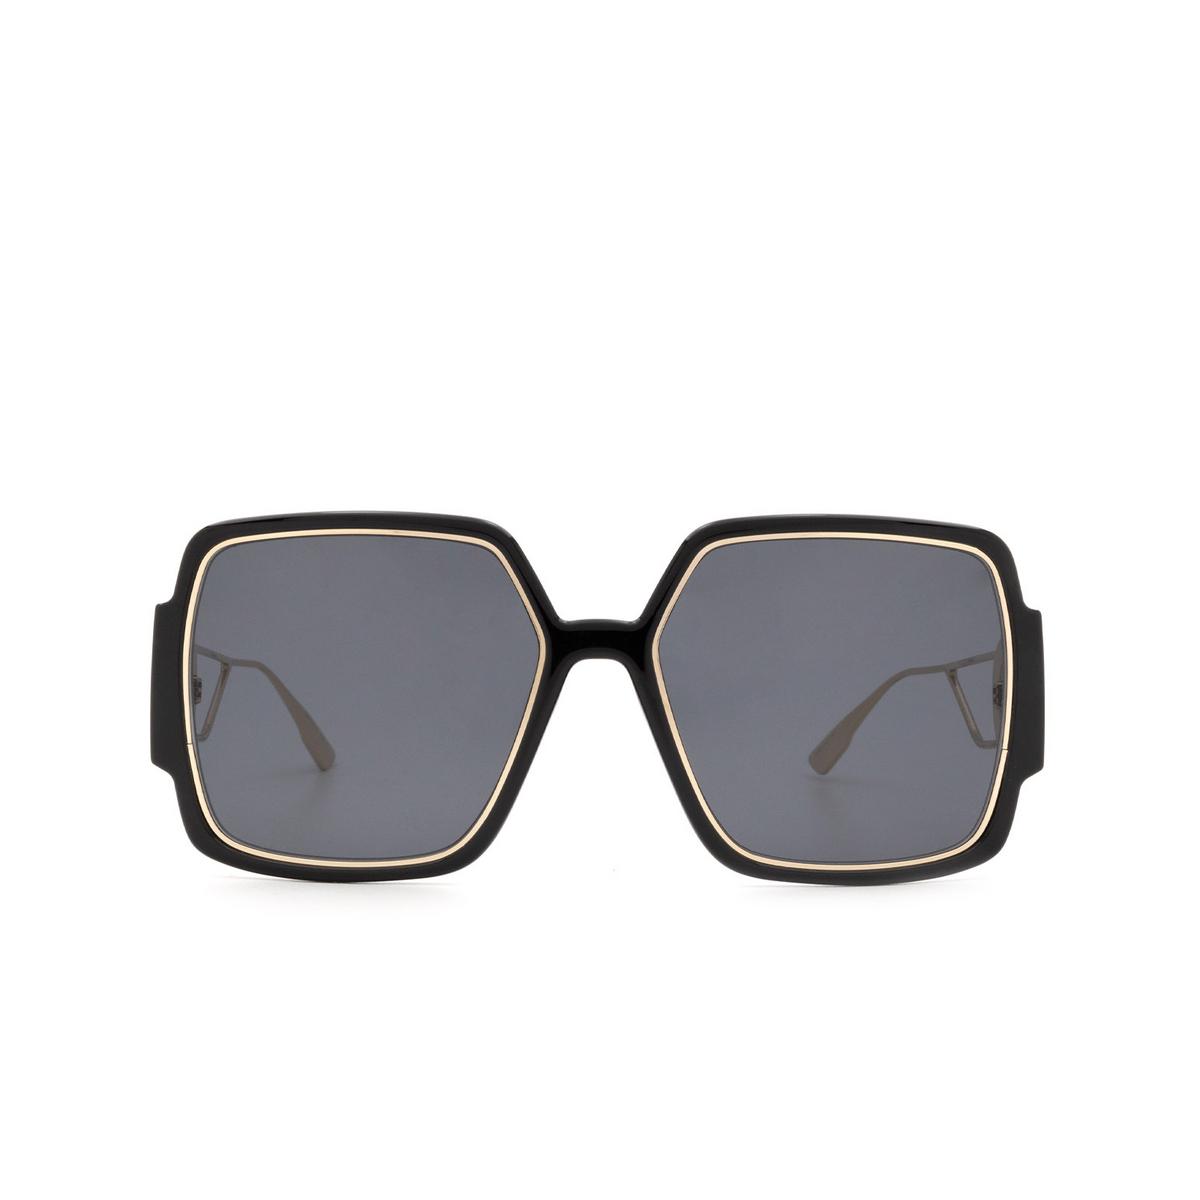 Dior® Square Sunglasses: 30MONTAIGNE2 color Black Gold 2M2/2K - front view.